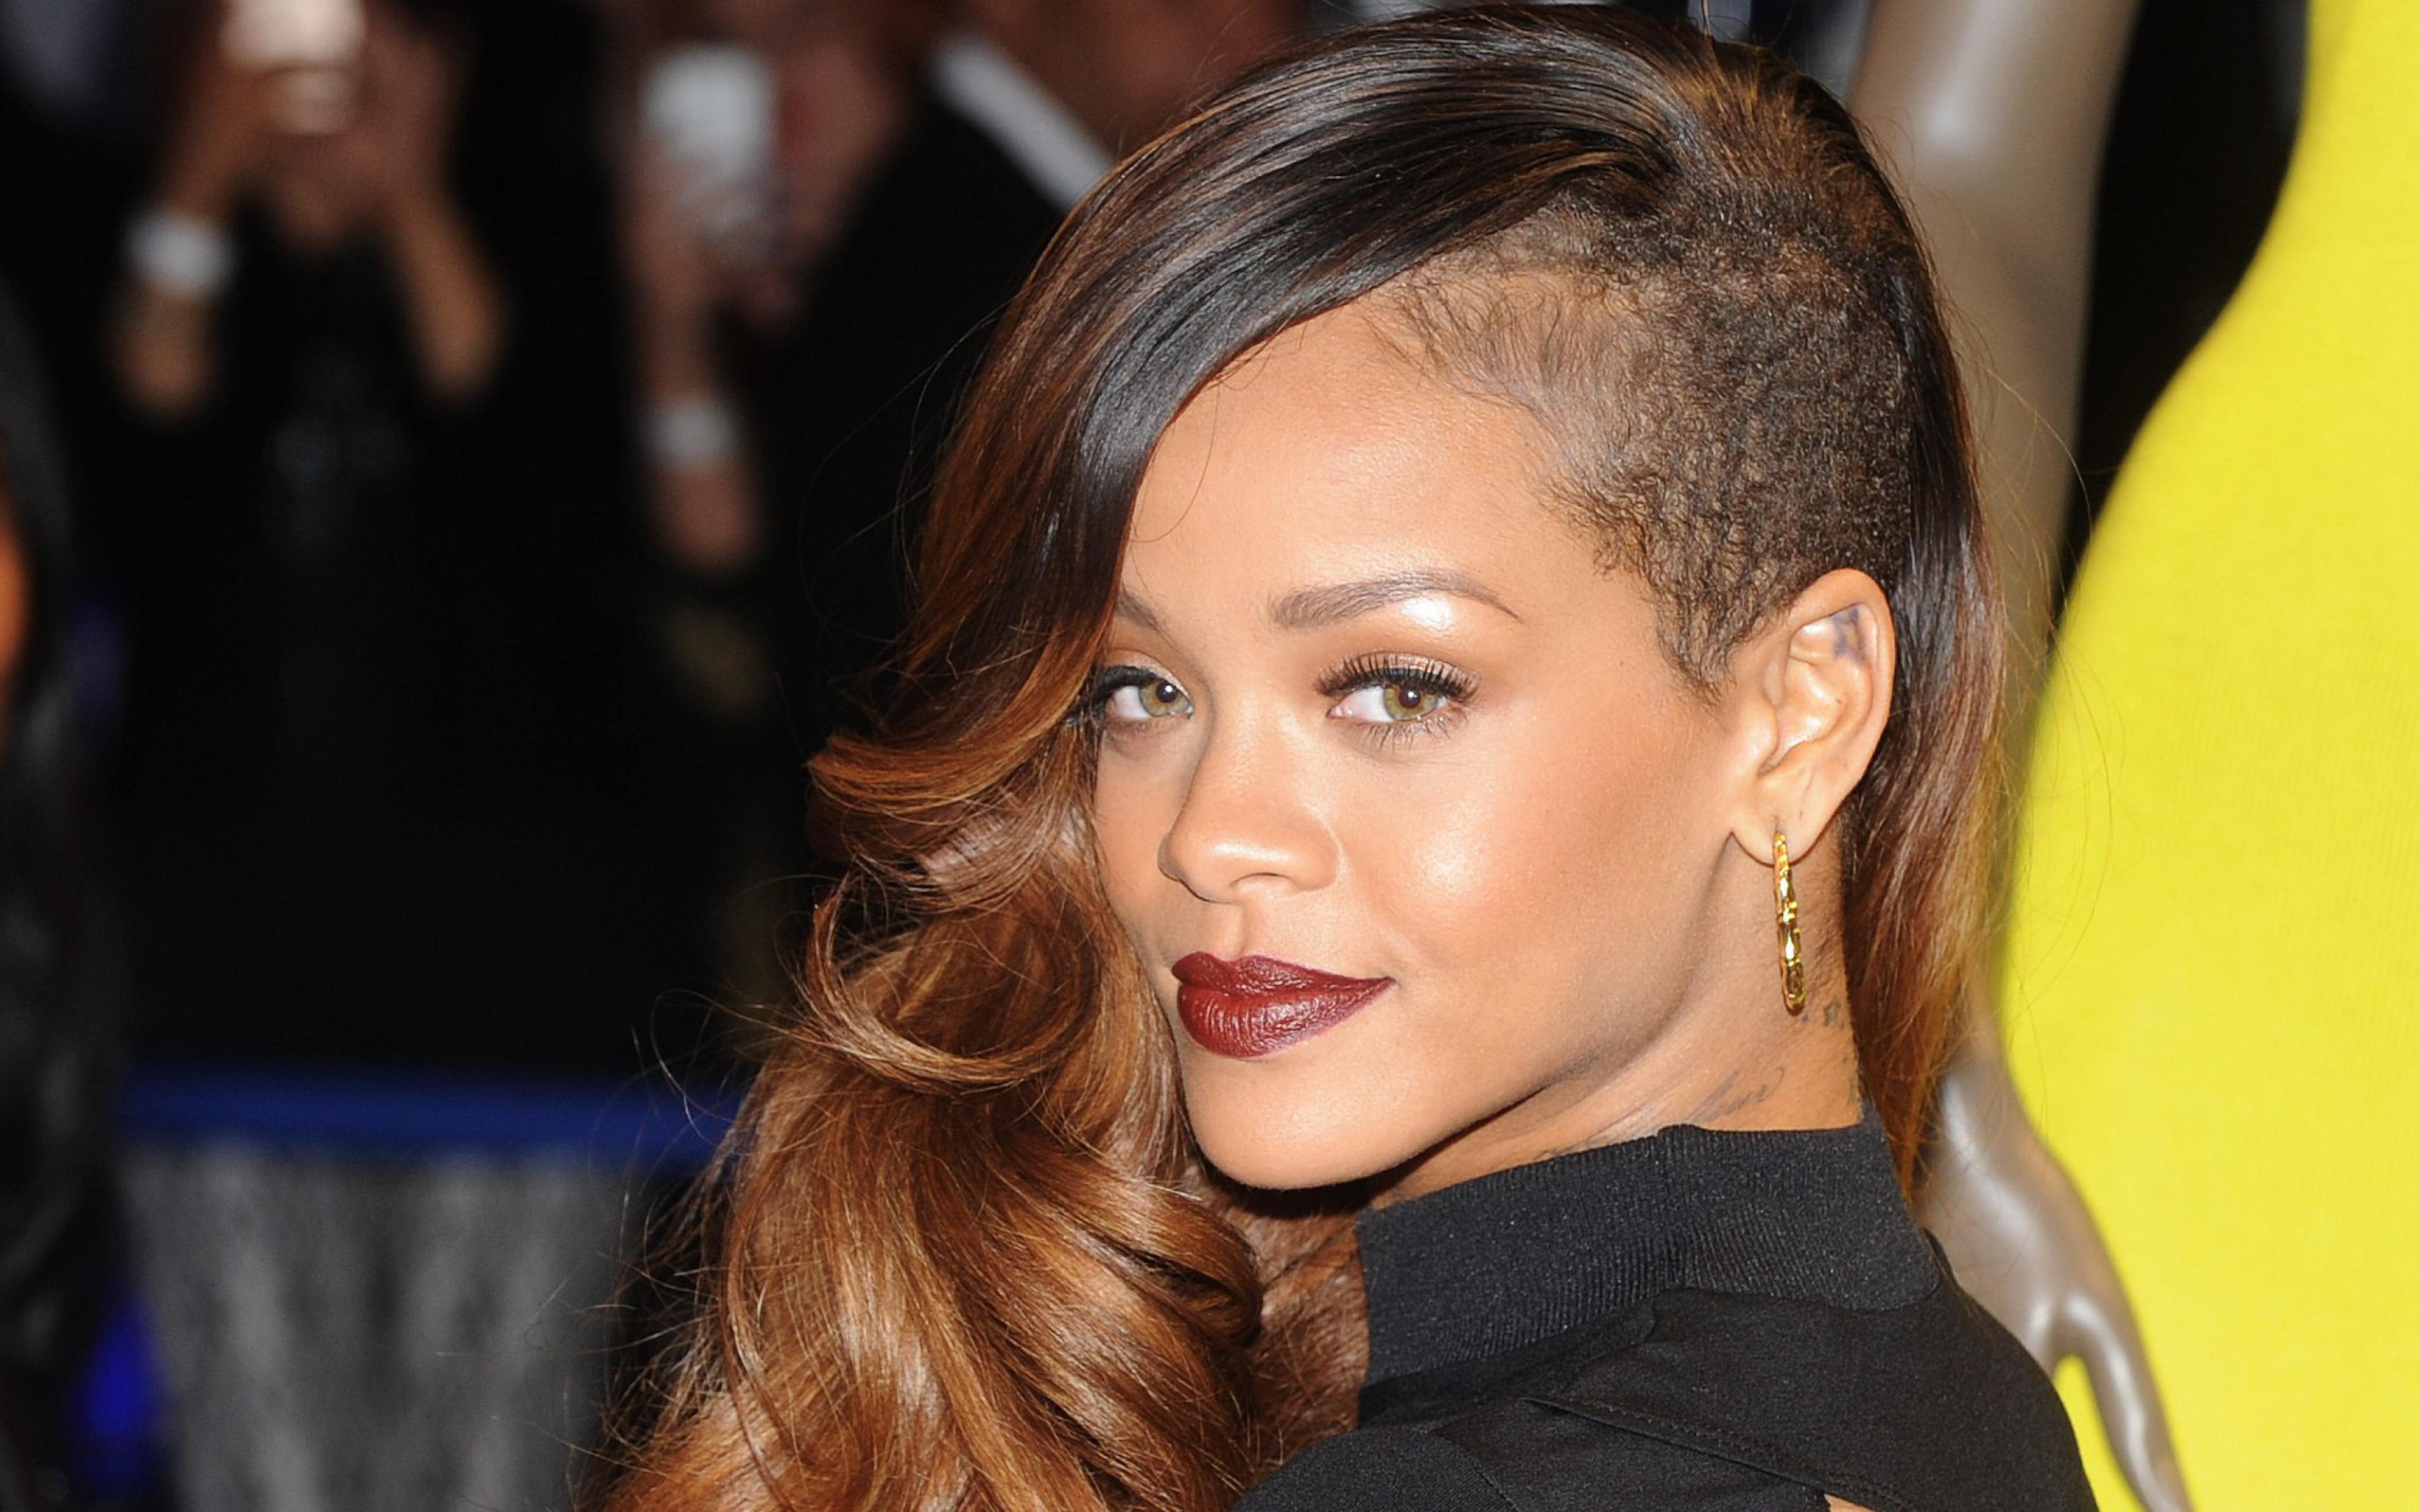 Download Wallpaper 3840x2400 Rihanna Grammy 2015 Singer Ultra HD 4K 3840x2400